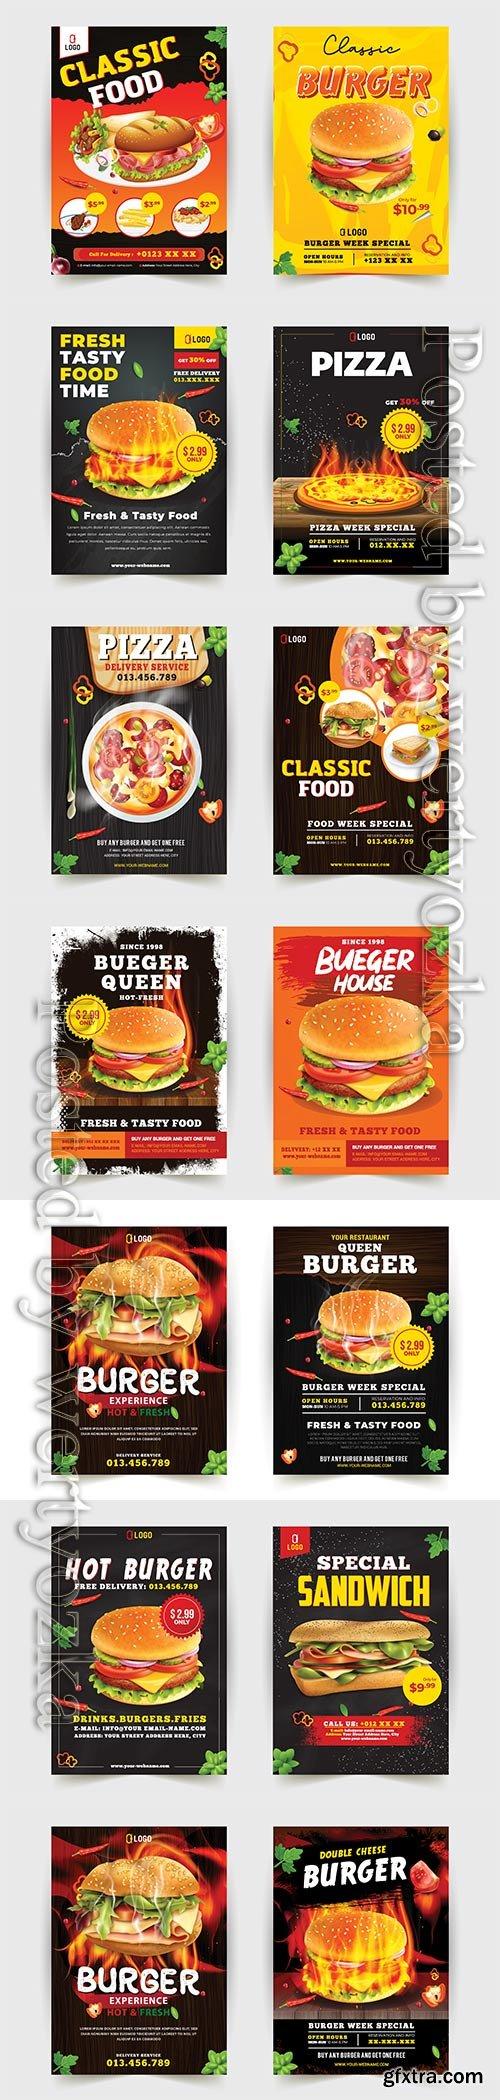 Fast food flyer design template cooking, cafe and restaurant menu